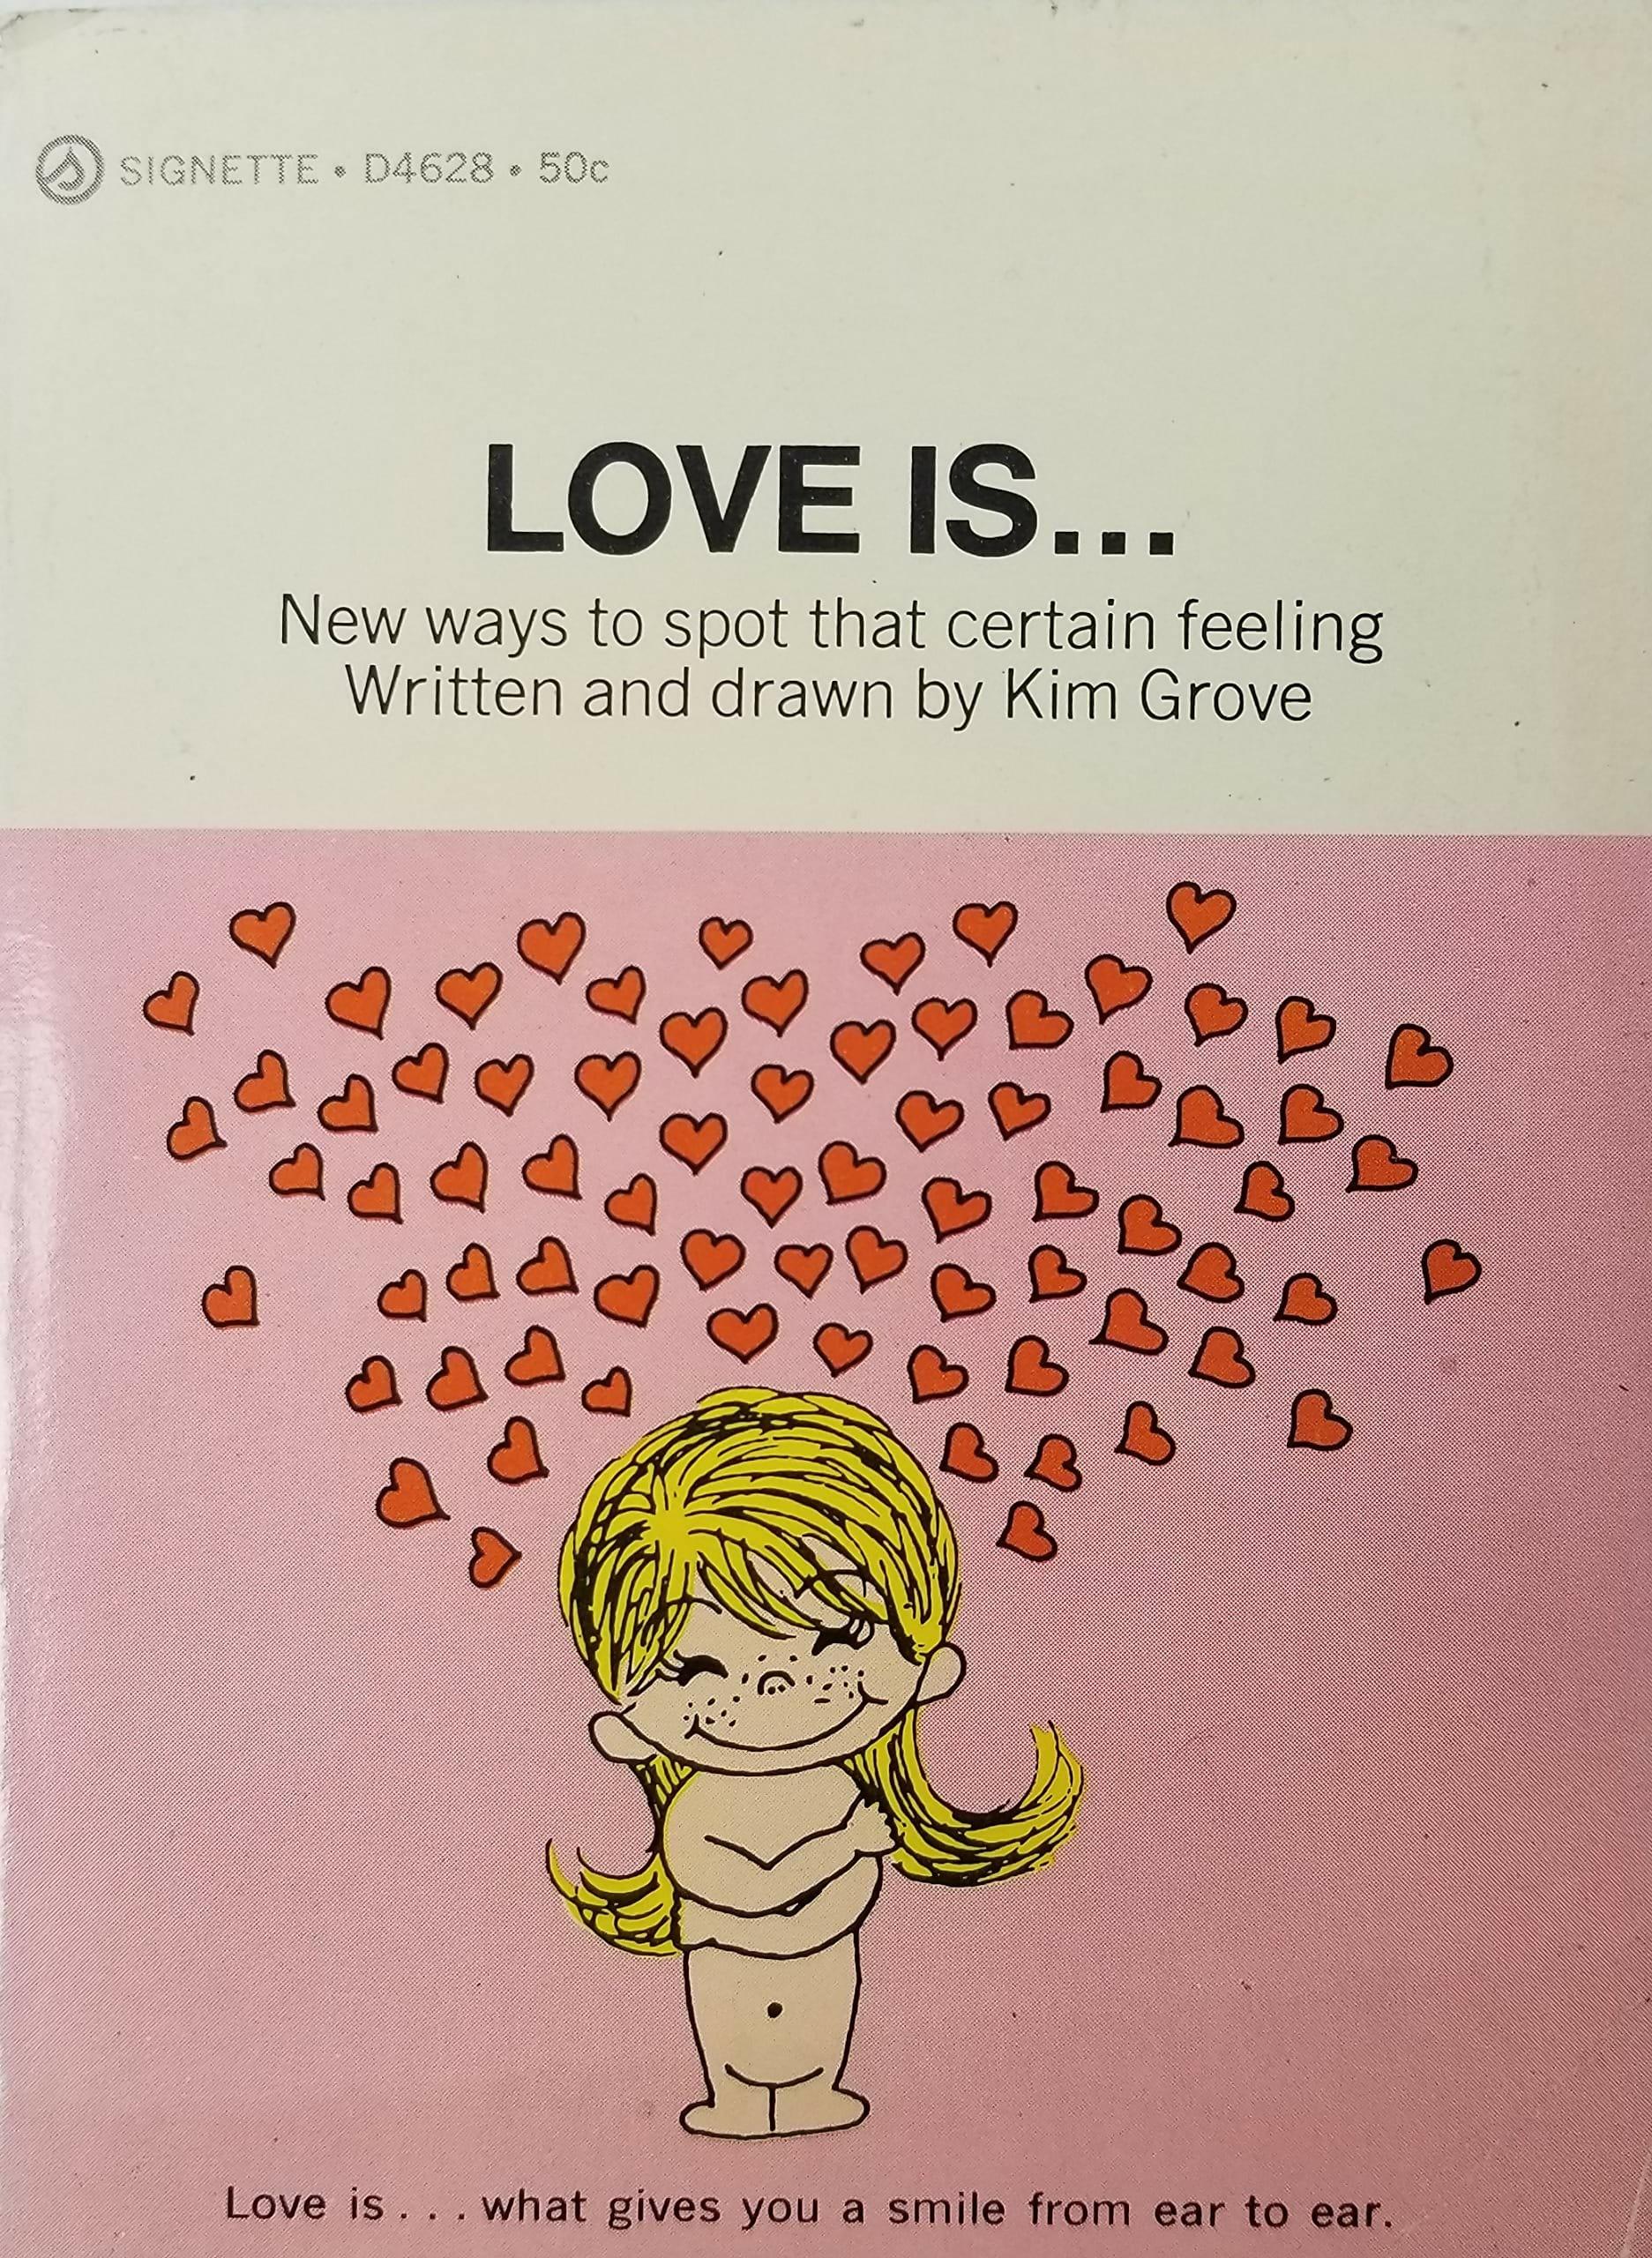 Macintosh HD:Users:brittanyloeffler:Downloads:Upwork:Christmas Gift:Love-Is.jpg